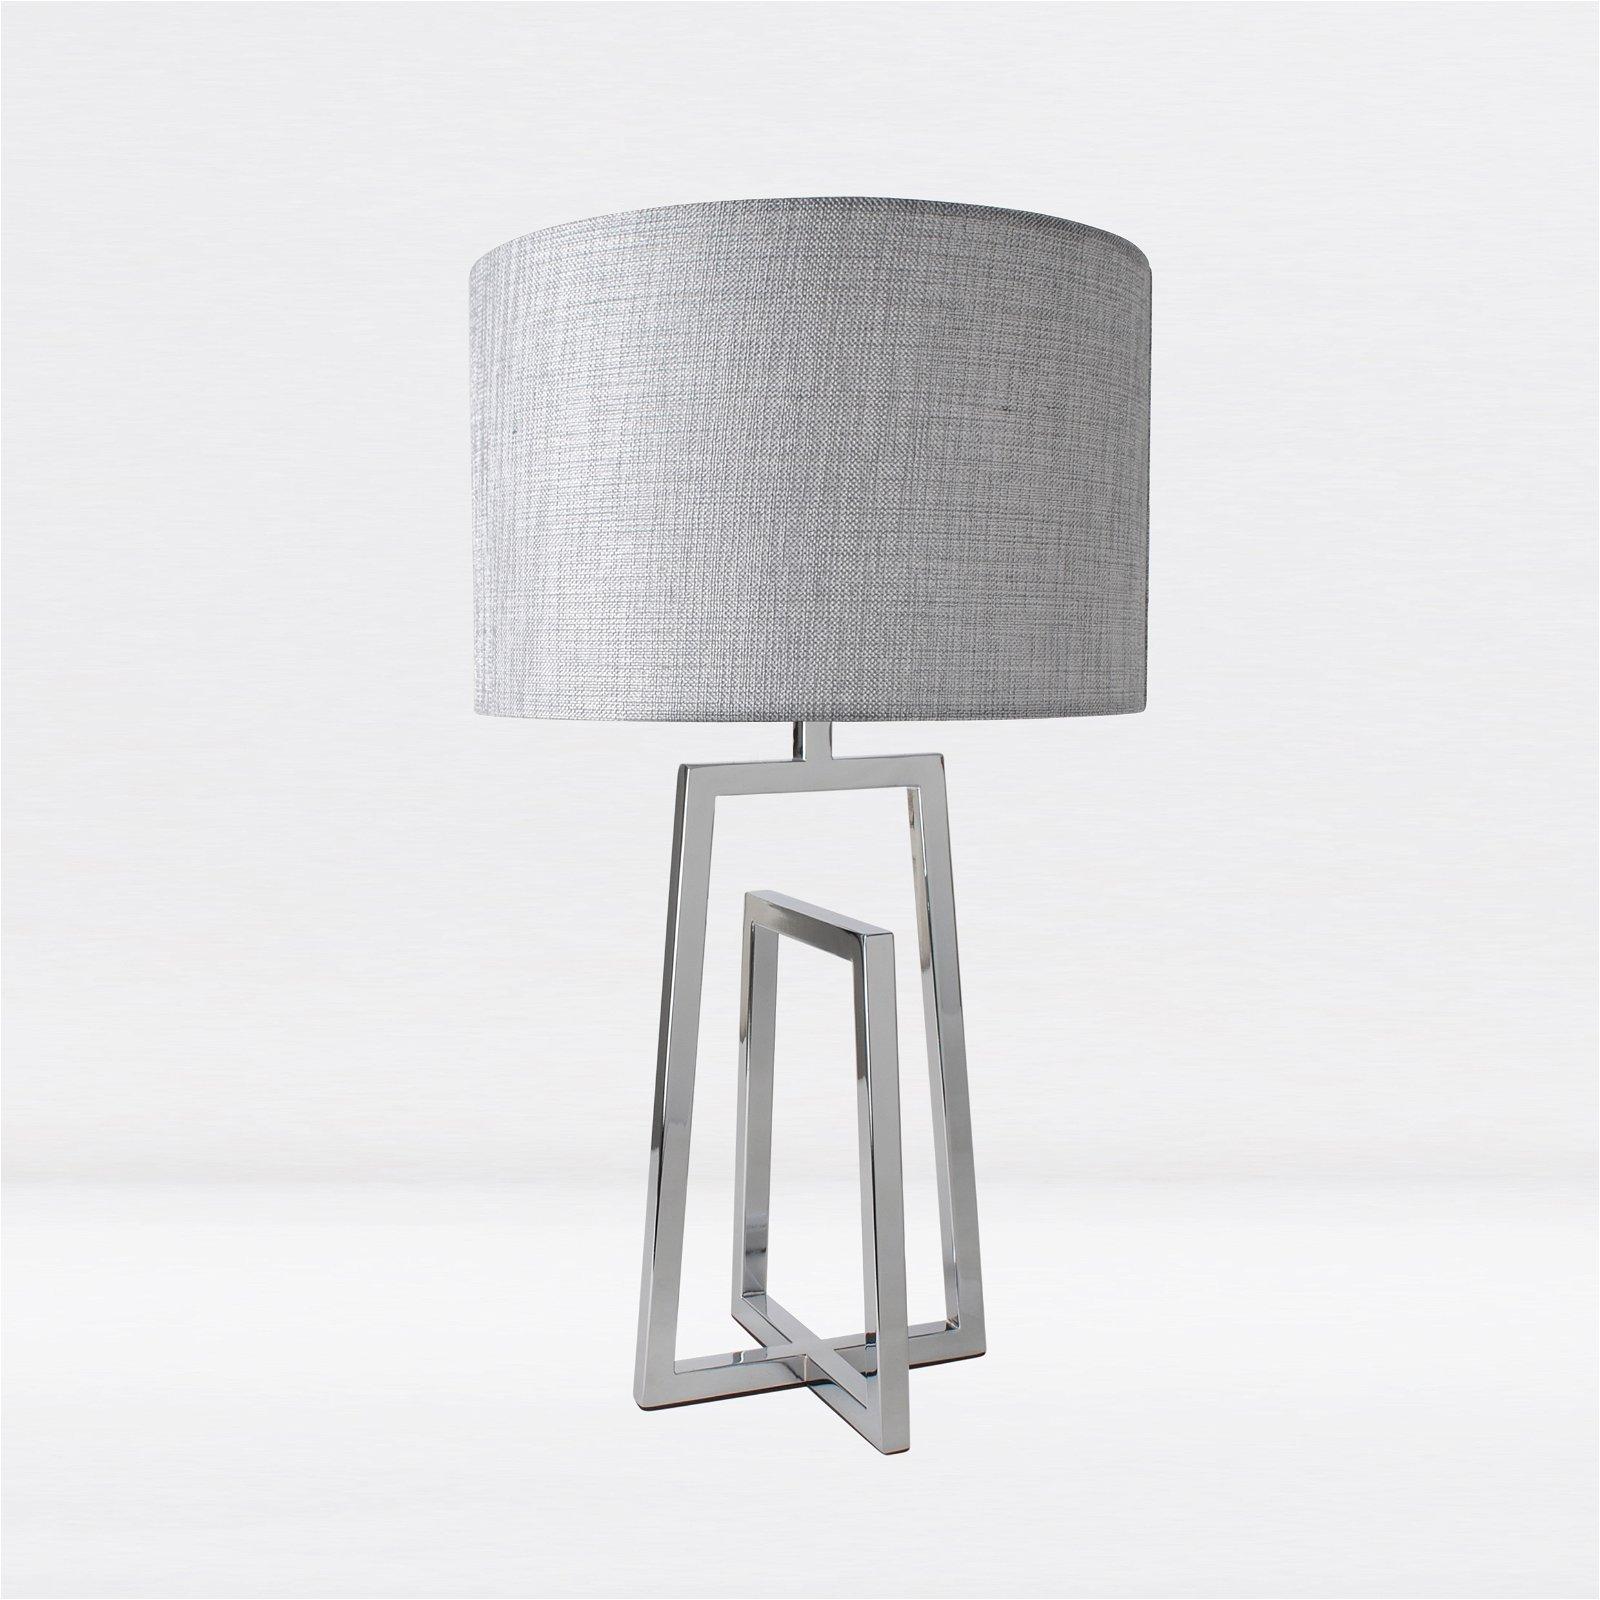 Contemporary Chrome Sculptural Table Lamp Bedside Light Silver Grey Shade Ebay